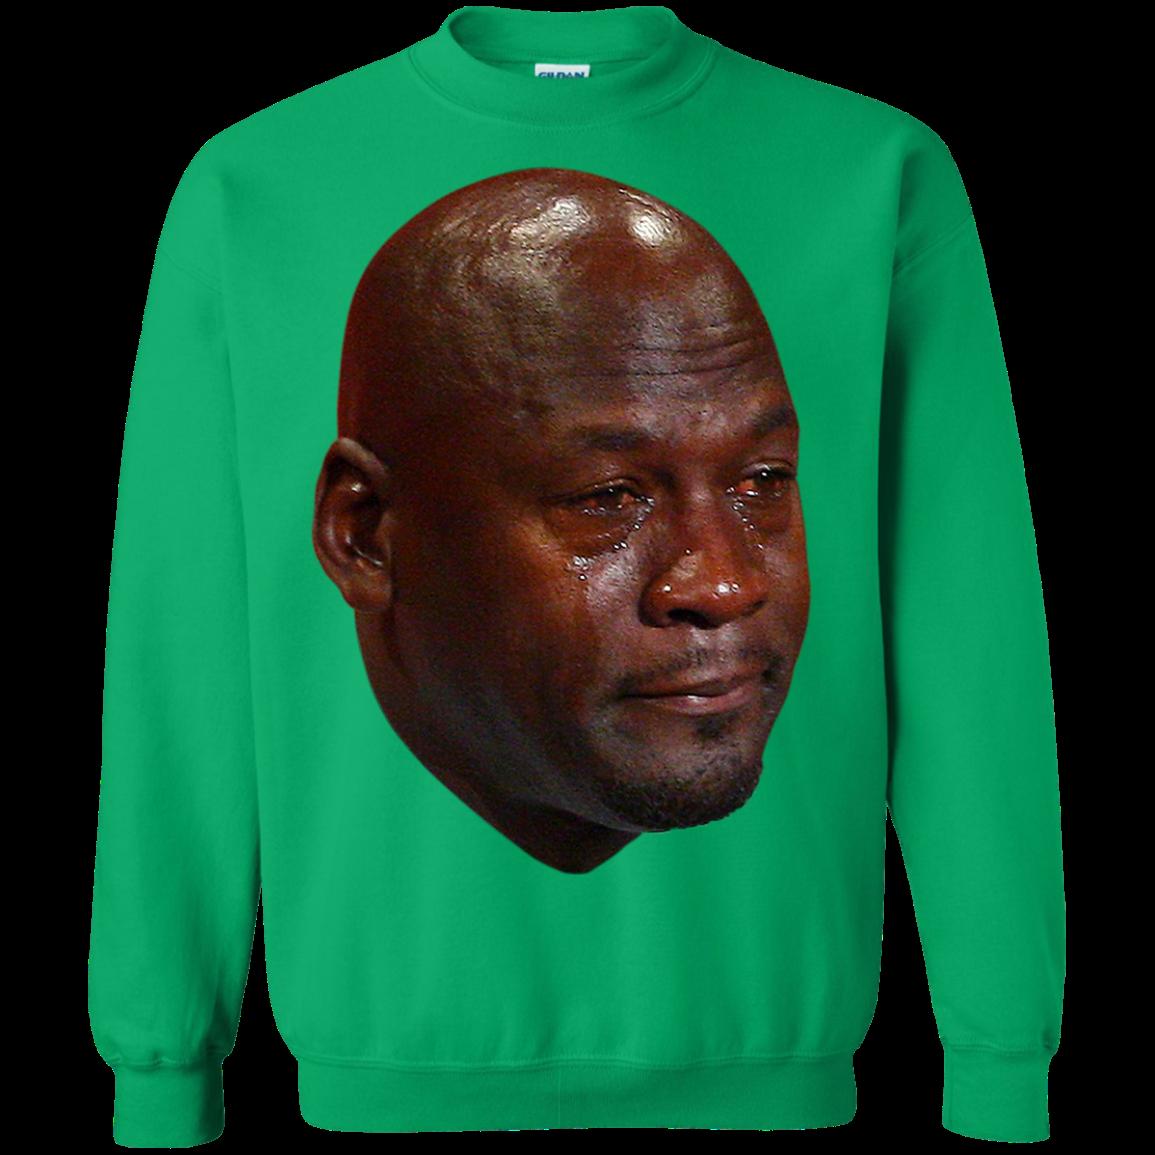 Crying Jordan Sweatshirt Crying meme, Crying meme face